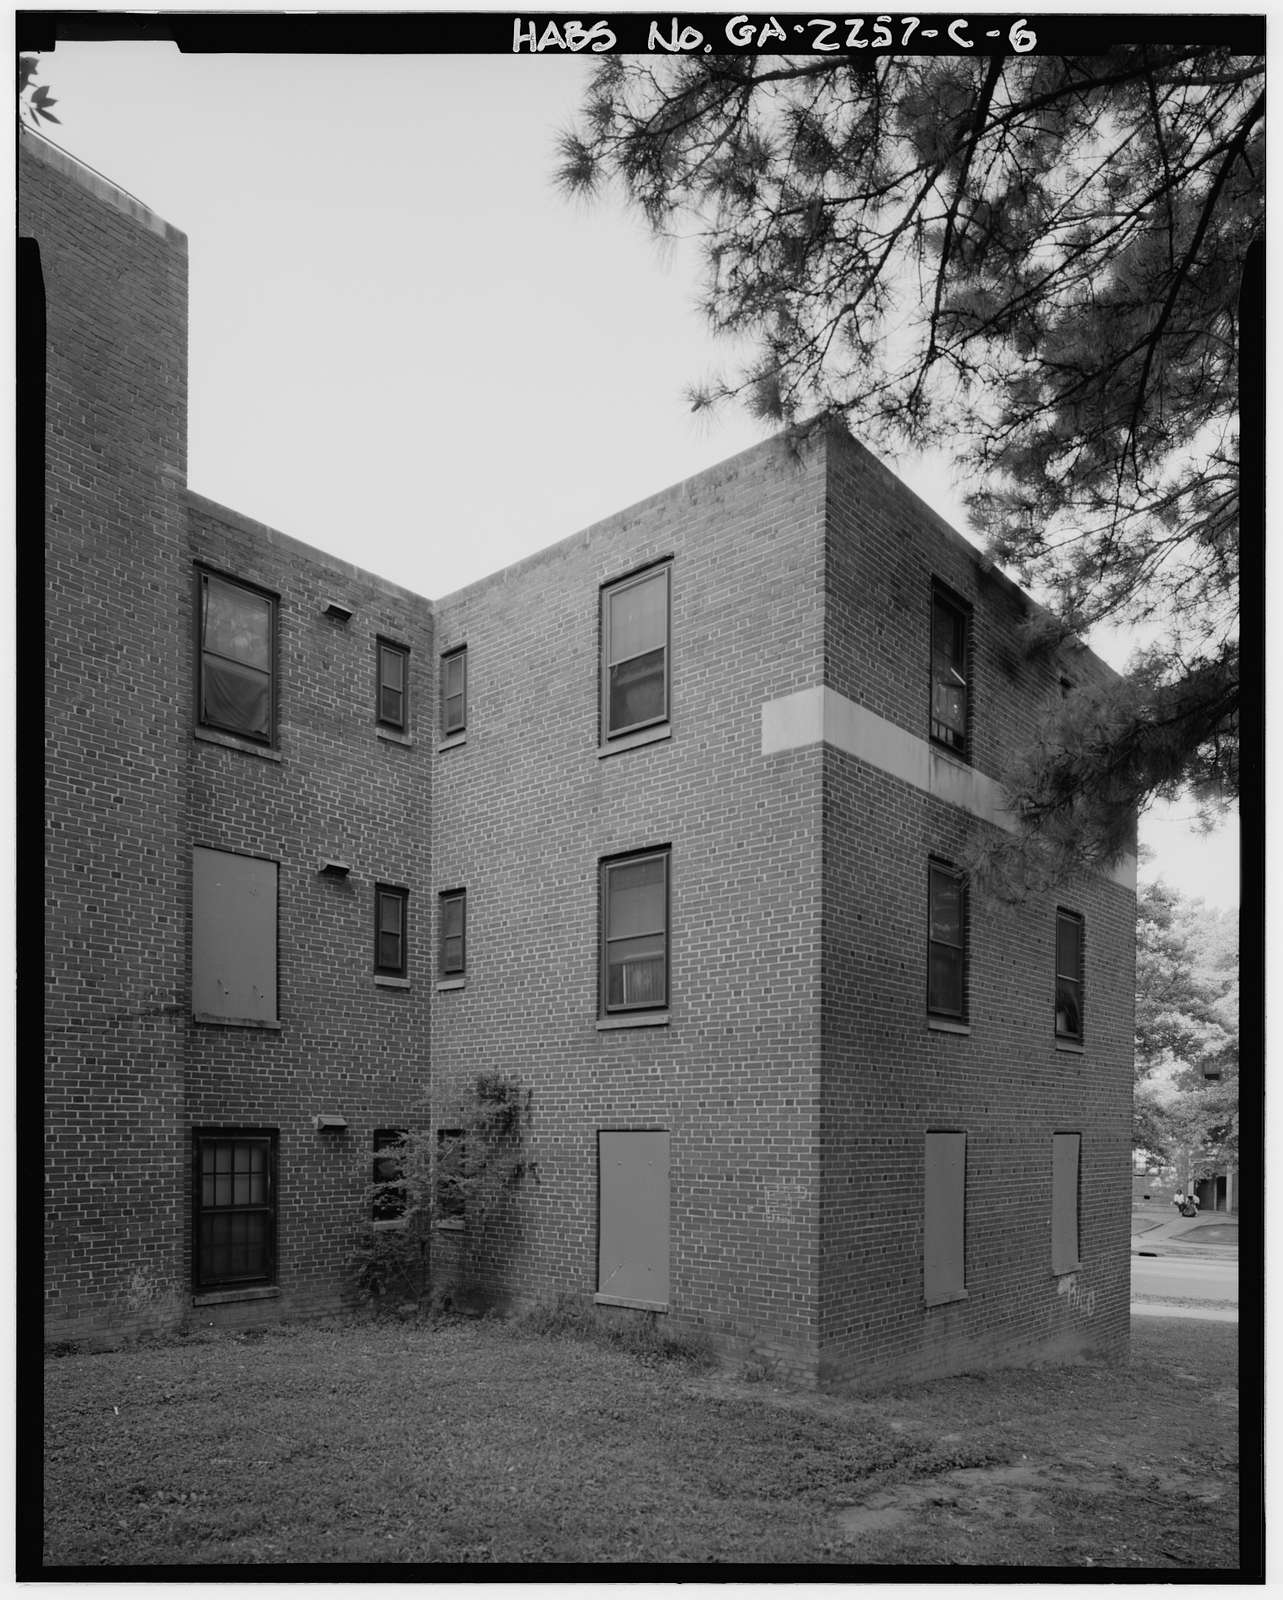 Techwood Homes, Building No. 1, 575-579 Techwood Drive, Atlanta, Fulton County, GA